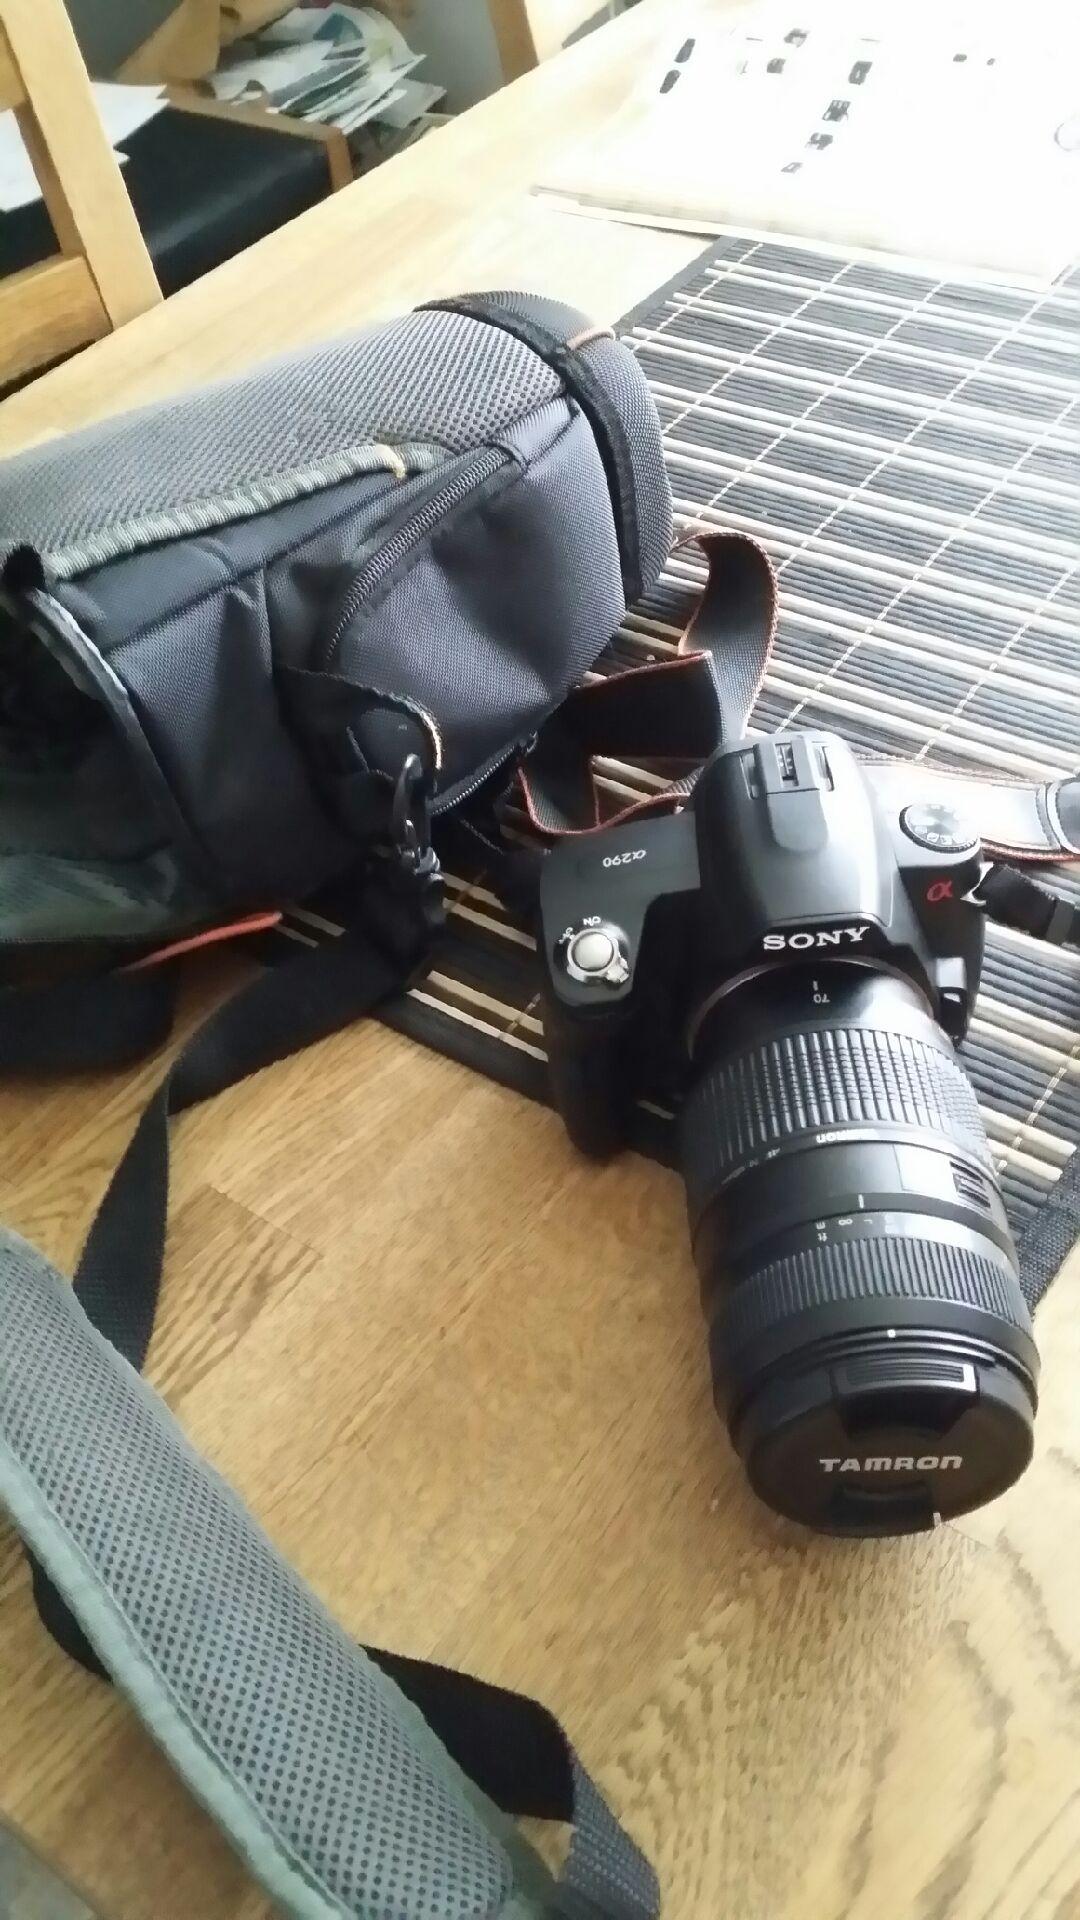 Grym kamera